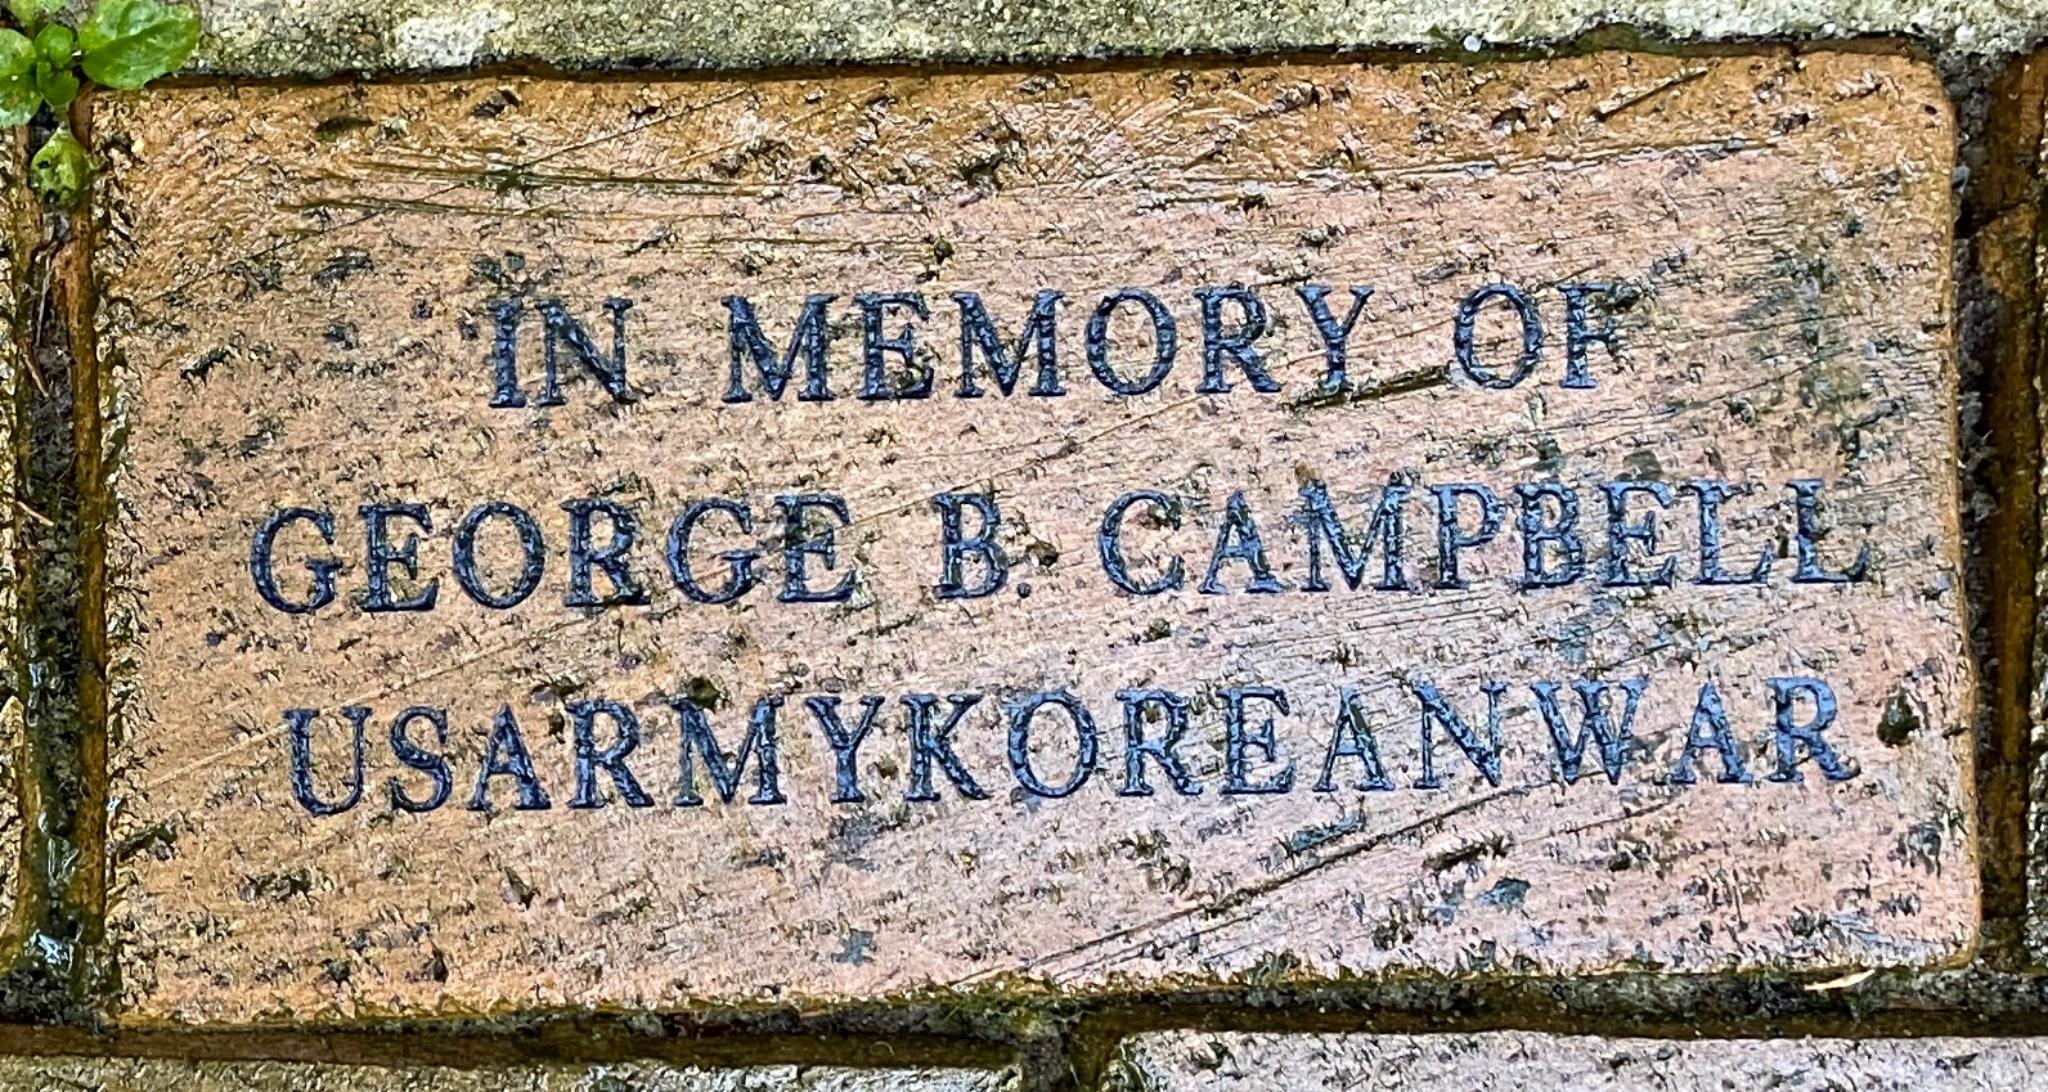 IN MEMORY OF  GEORGE B. CAMPBELL USARMYKOREANWAR